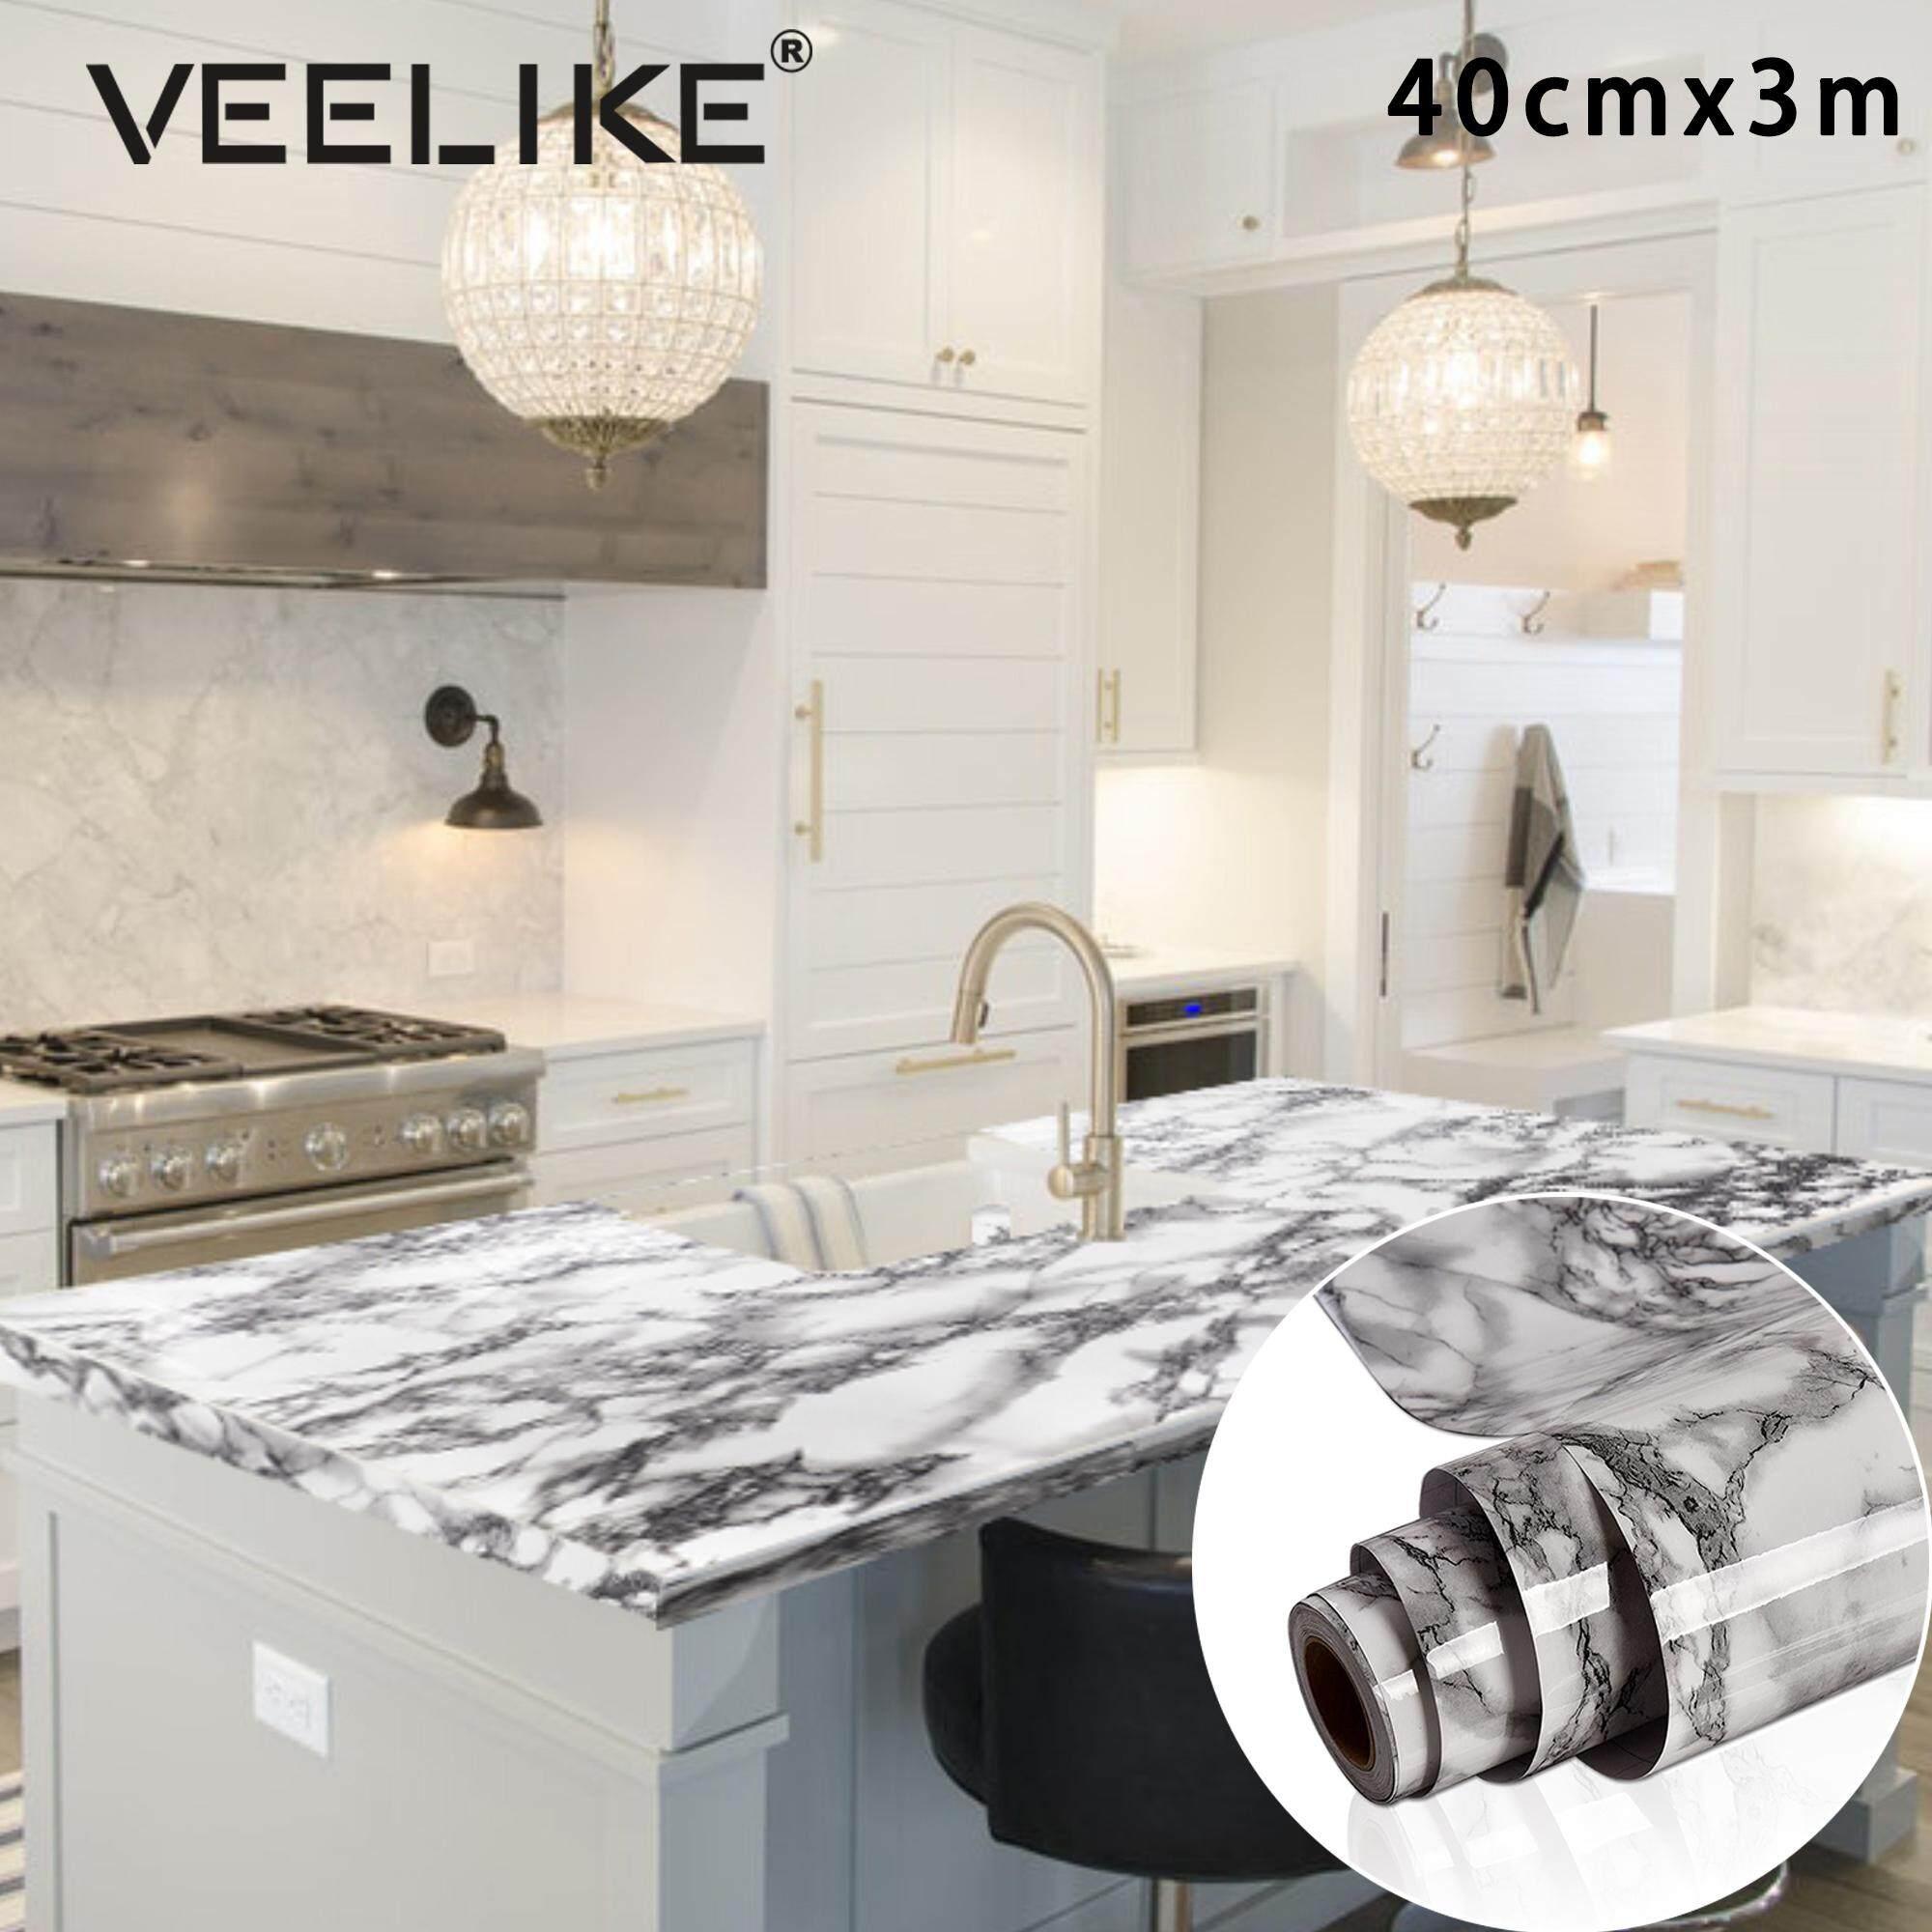 Countertop Self Adhesive Vinyl Film Marble Wallpaper Kitchen Cabinet Furniture Wallpaper Rolls Sheets Home Garden